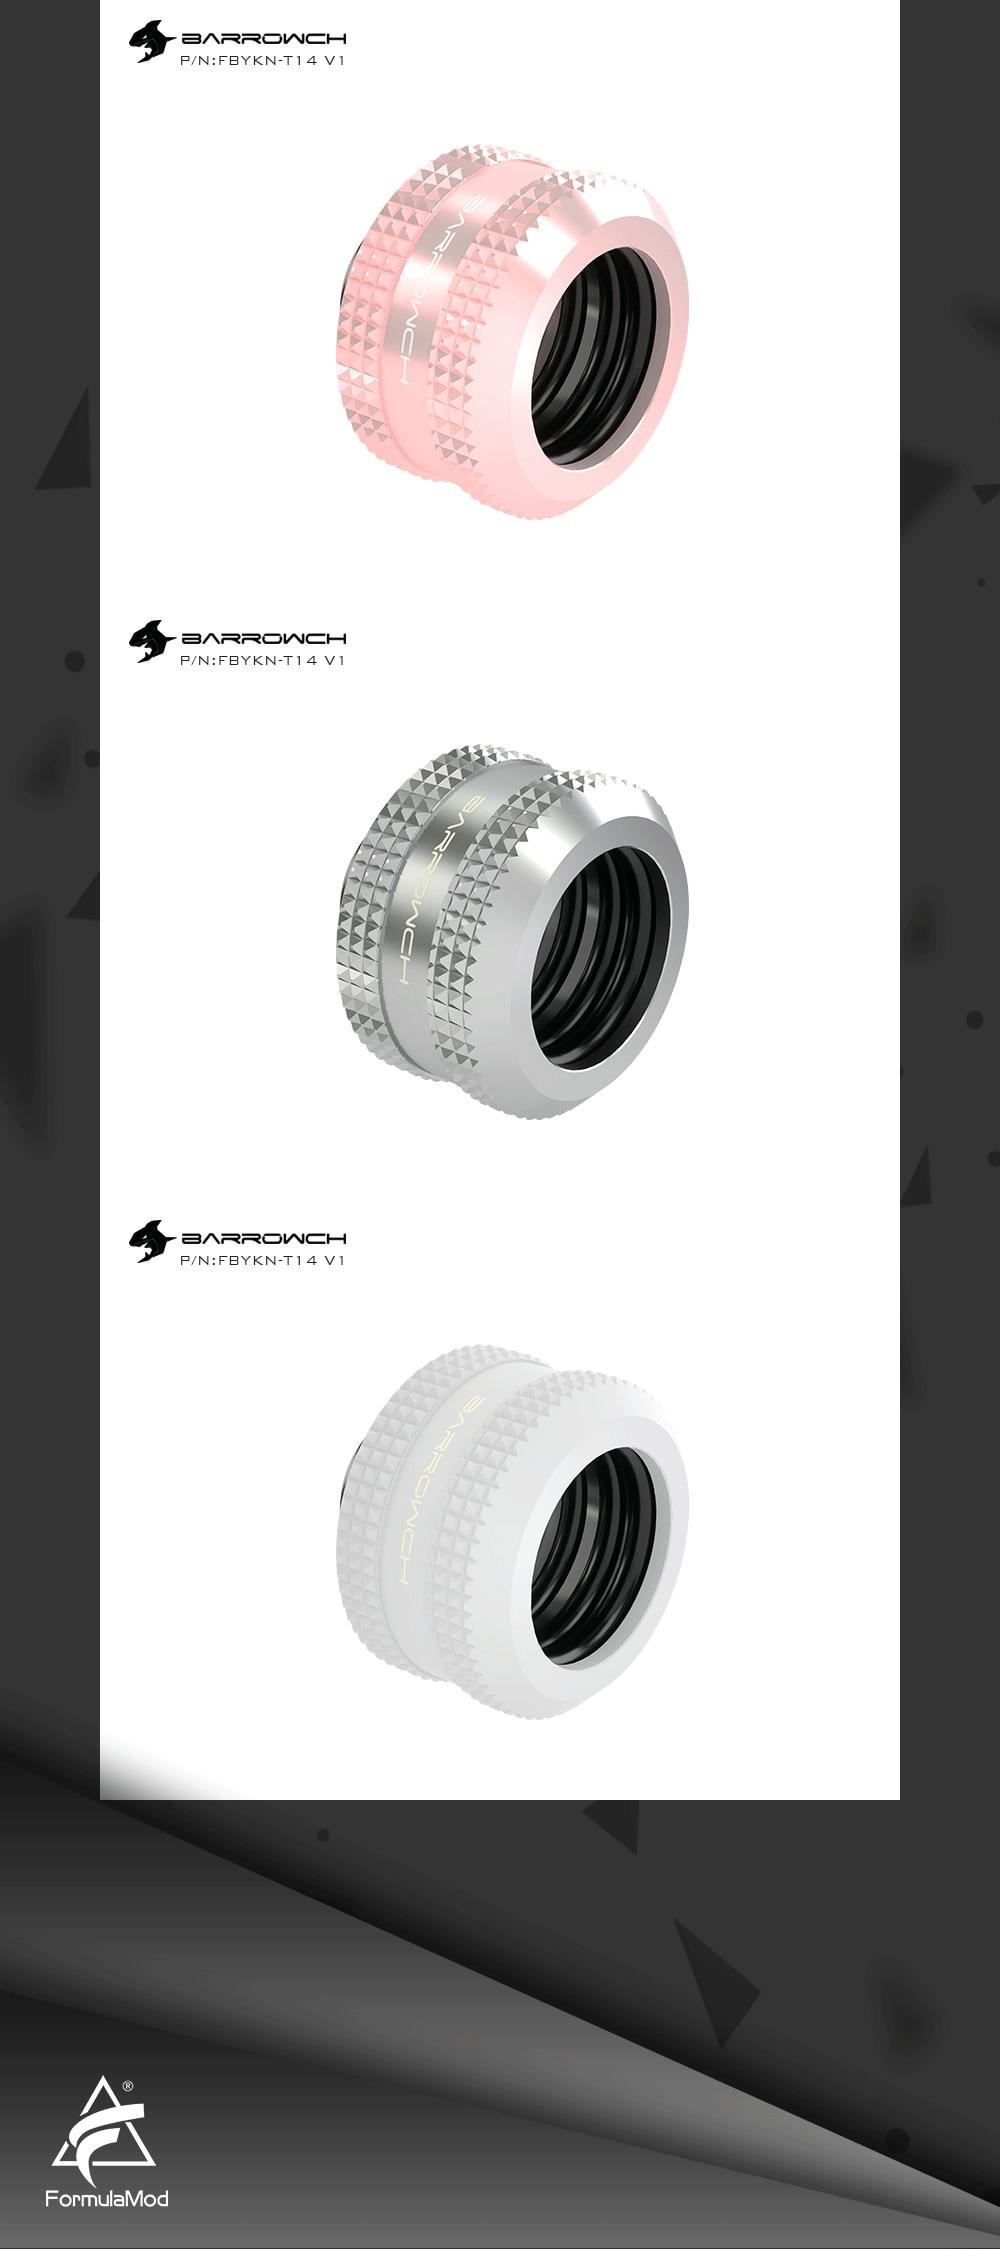 Barrowch Hard Tube Fitting For OD 12/14/16mm , Aluminum Alloy Multiple Color Ring G1/4 Brass Adapter , FBYKN V1 Series